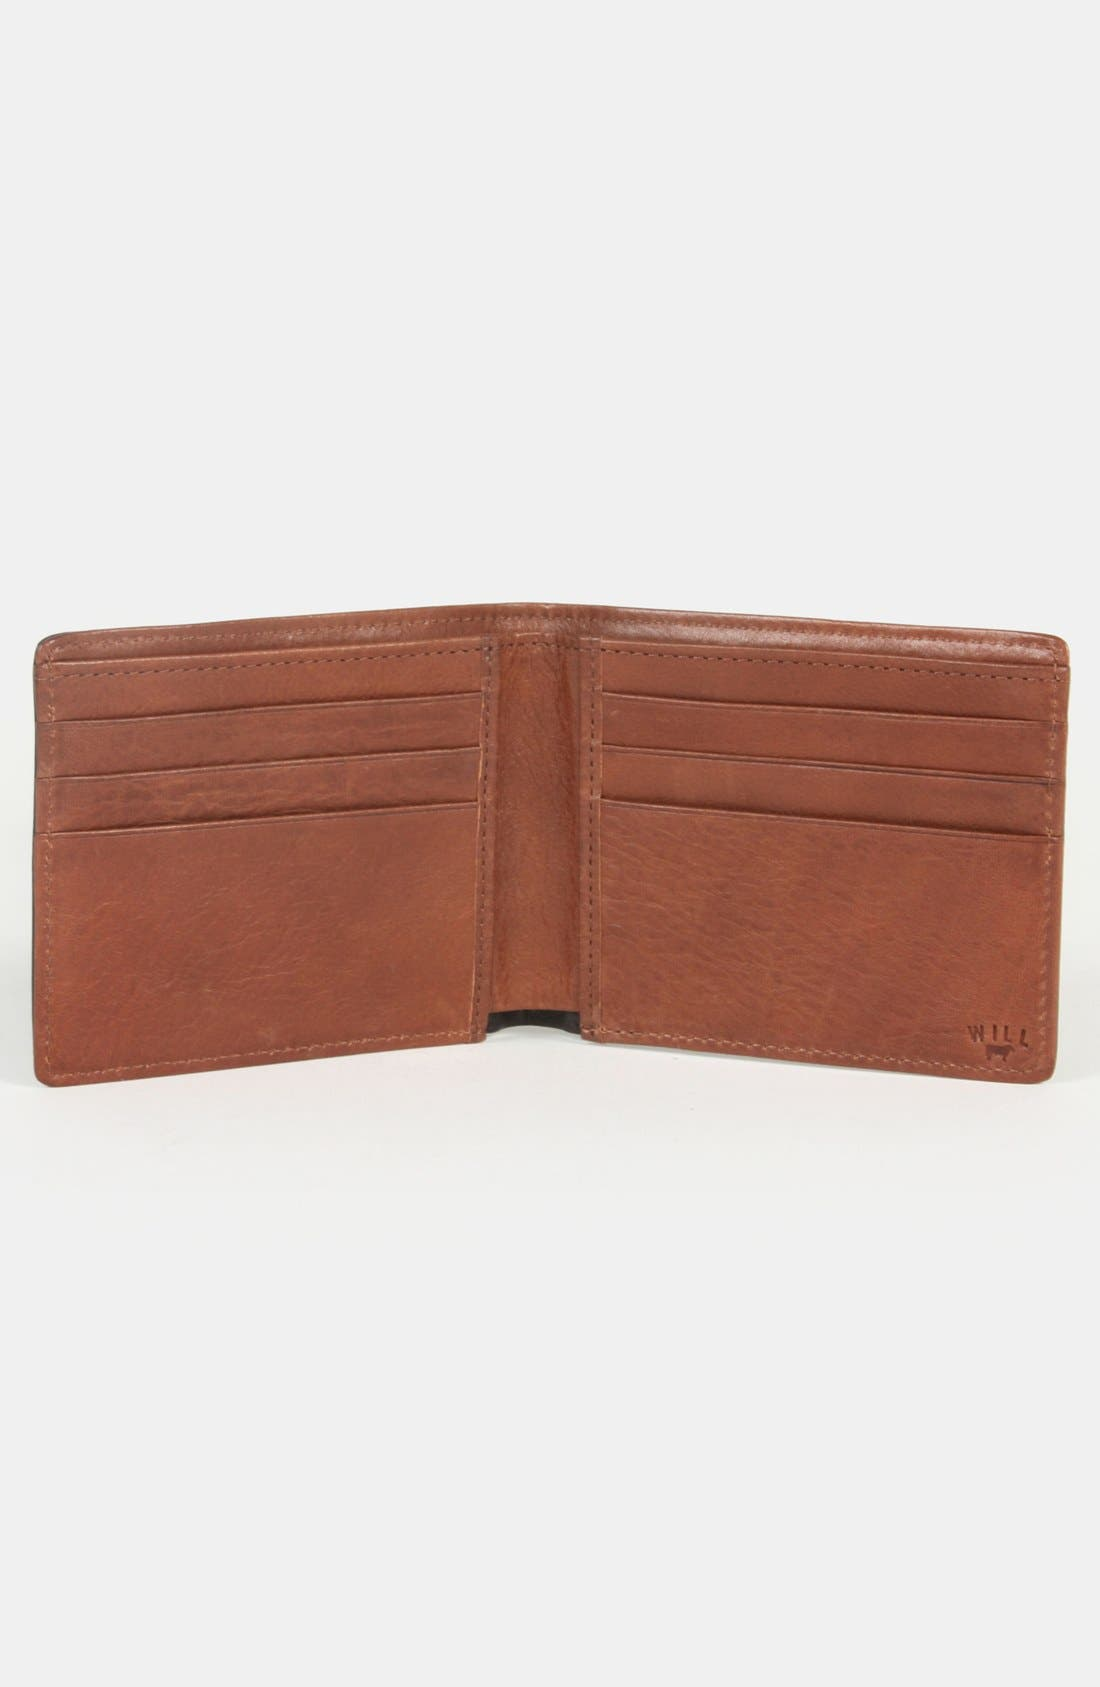 WILL LEATHER GOODS,                             'Barnard' Wallet,                             Alternate thumbnail 5, color,                             001